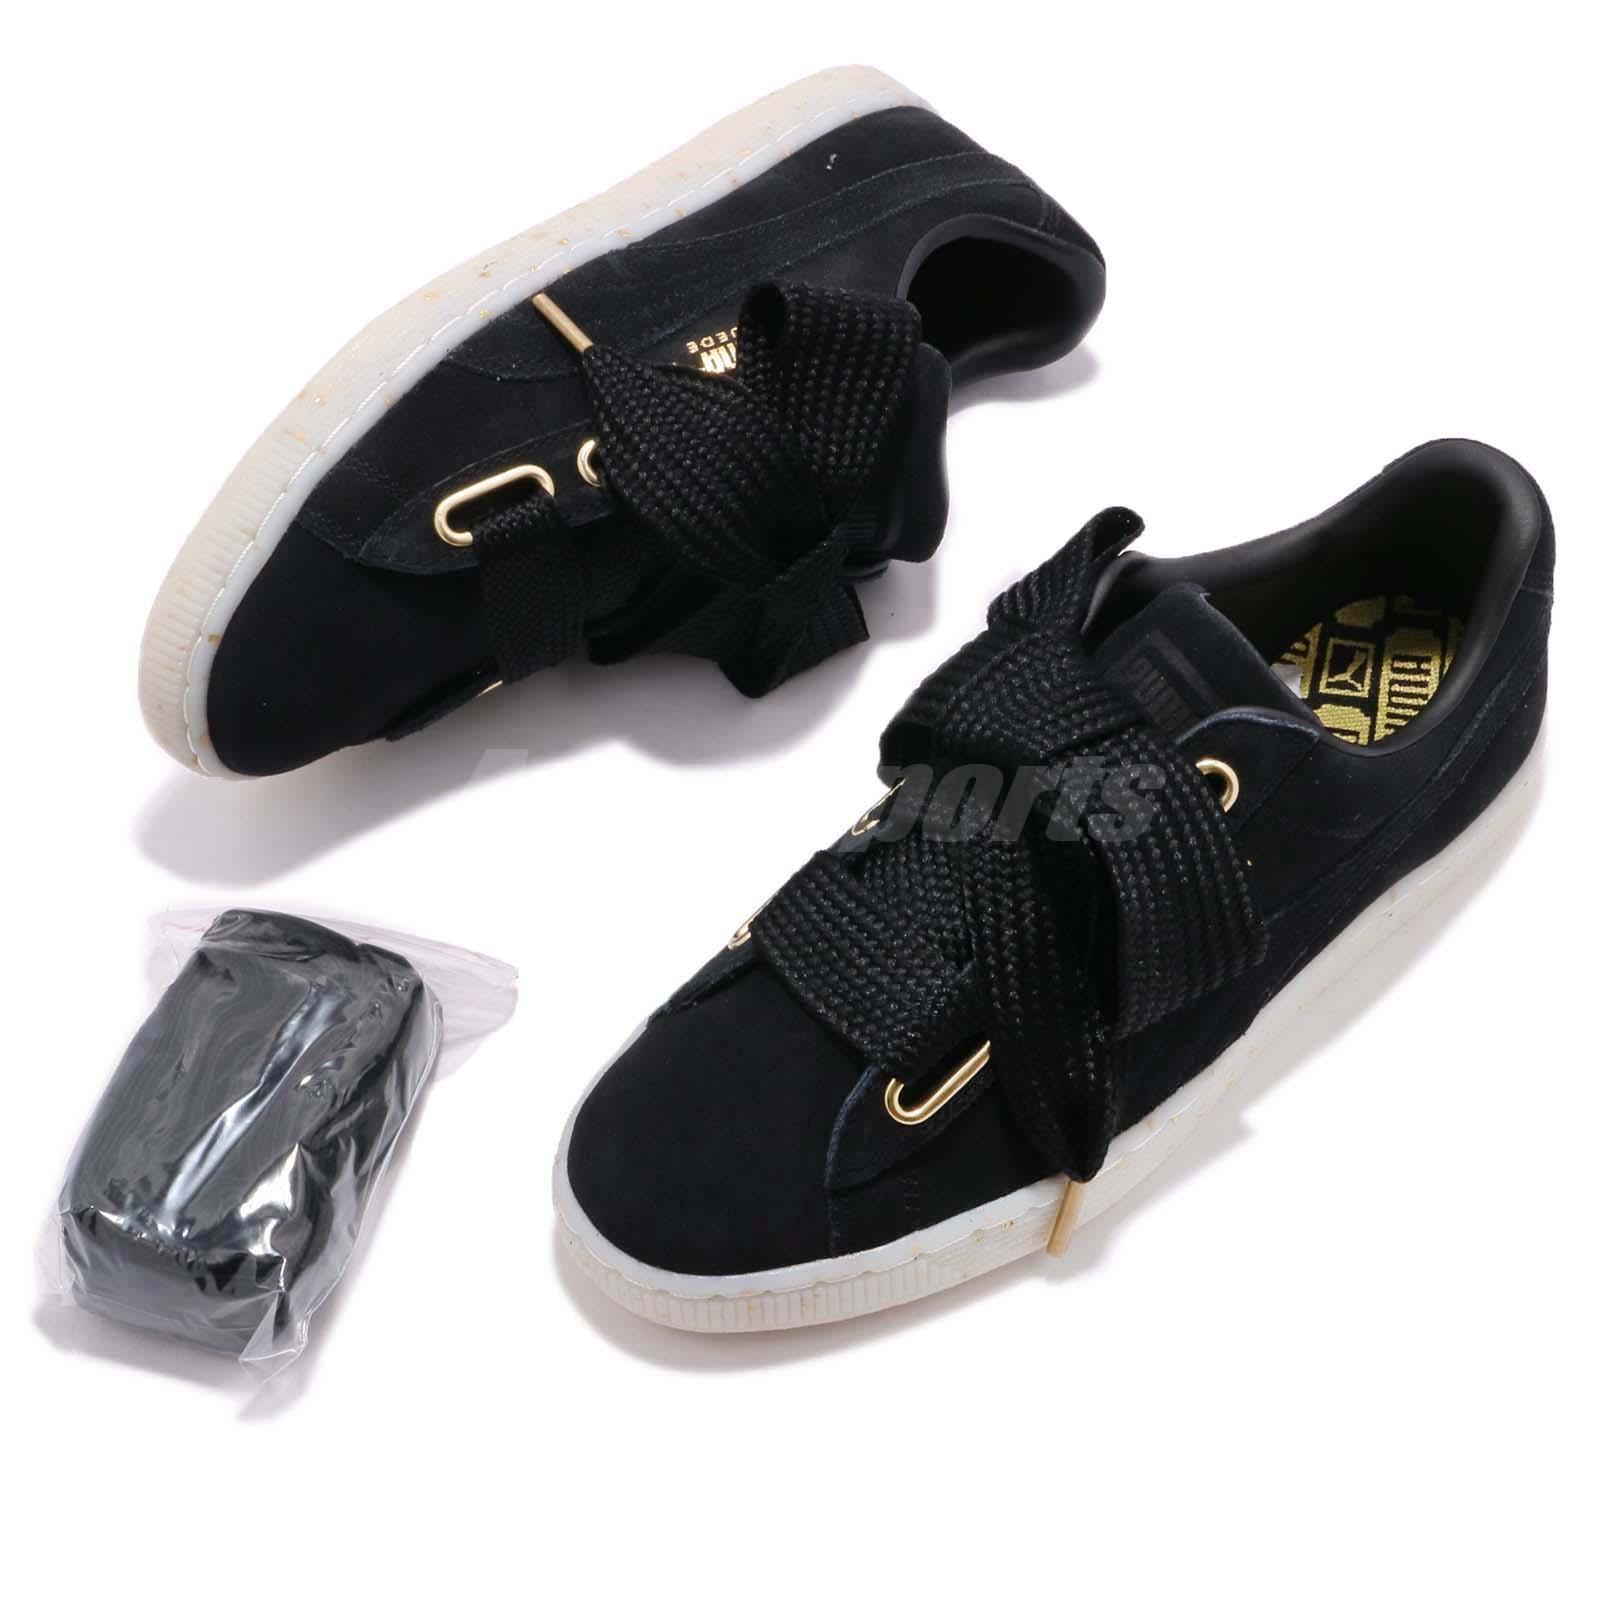 6ba88a581f3 Puma Suede Heart Celebrate Wns Suede Black Gold Women Shoes Sneakers ...